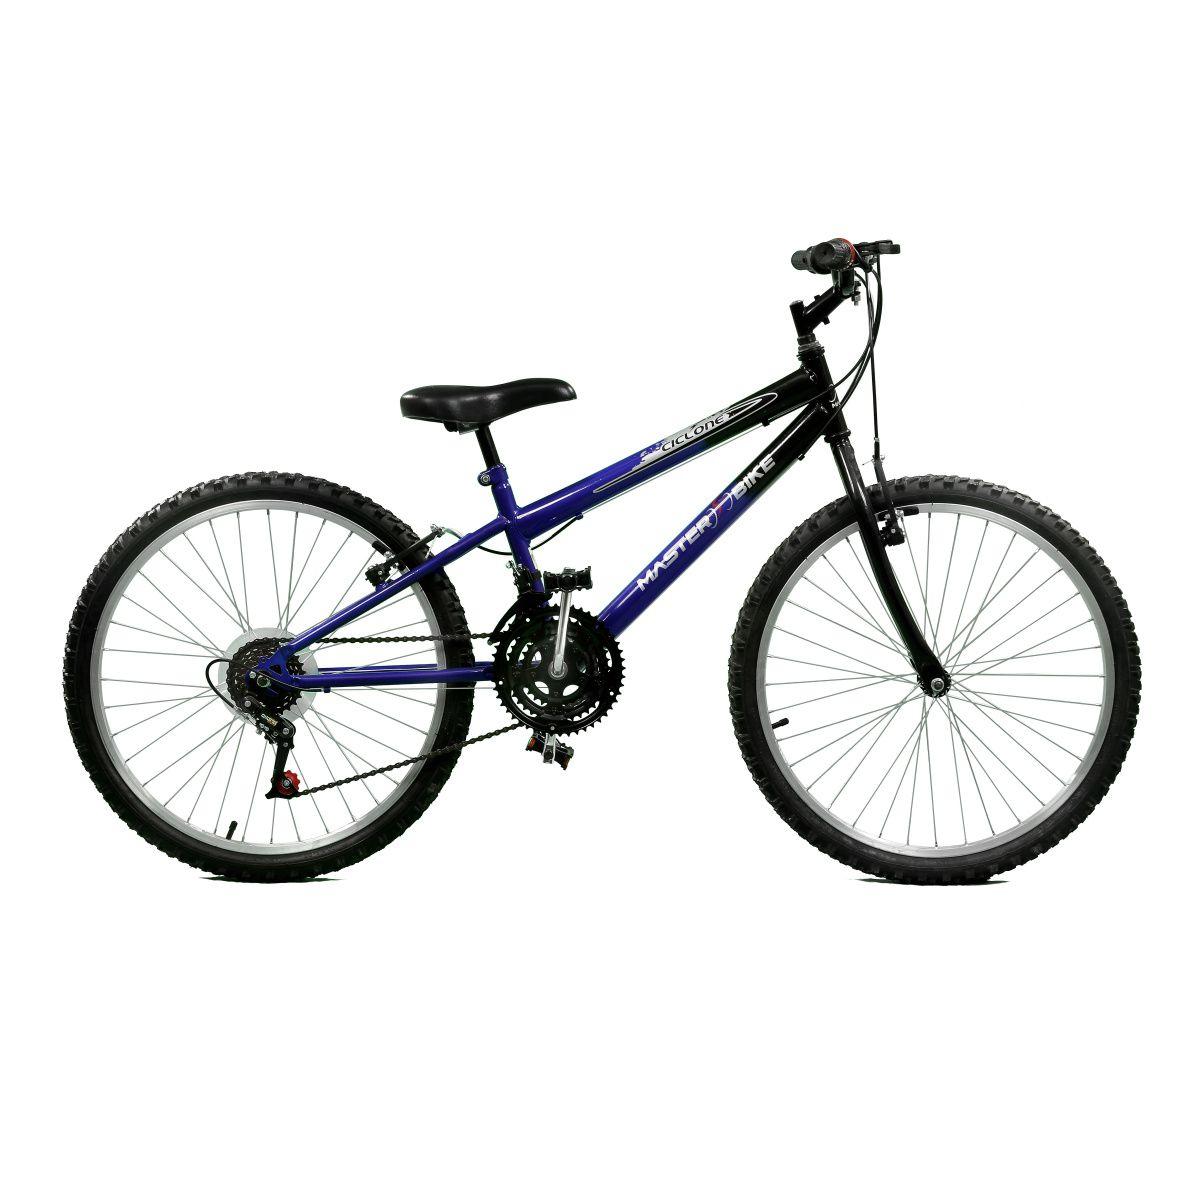 Bicicleta Master Bike Aro 24 Ciclone Plus 21 Marchas V-Brake Azul/Preto